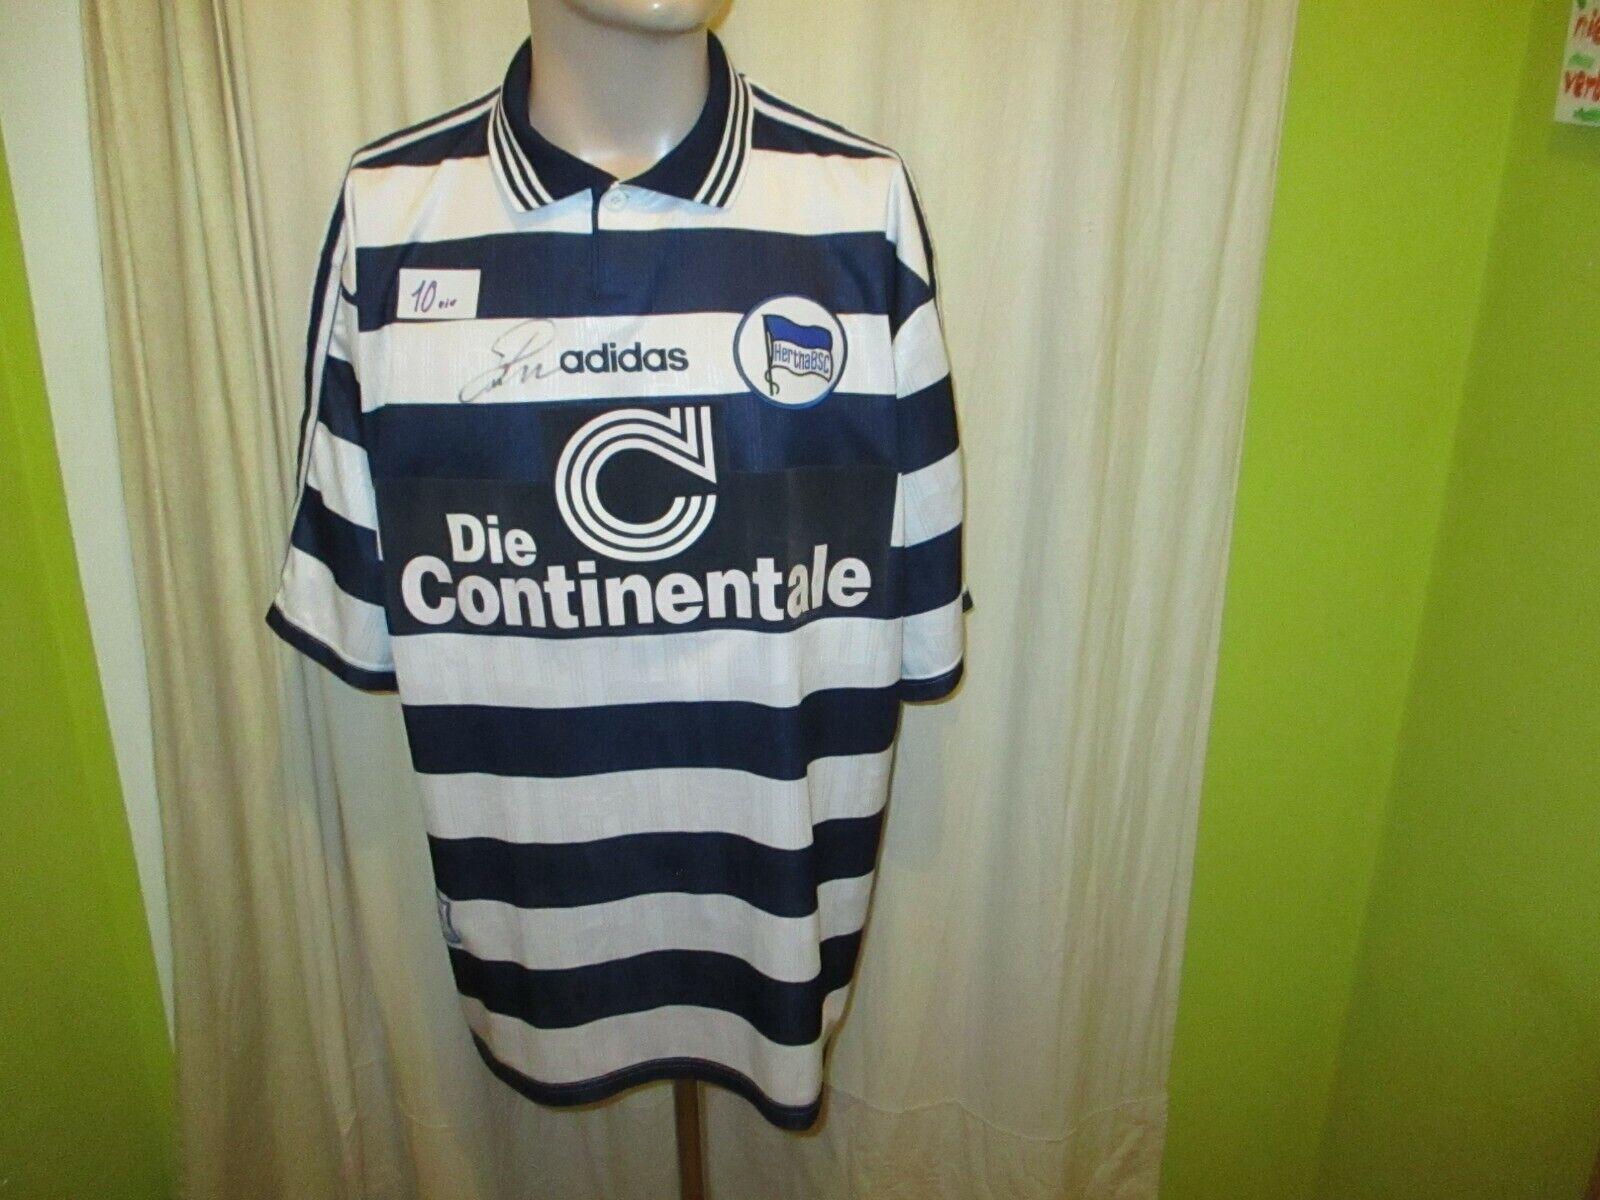 Hertha BSC Berlin Original Adidas Heim Trikot 1997 98  Die Continentale  Gr.XL